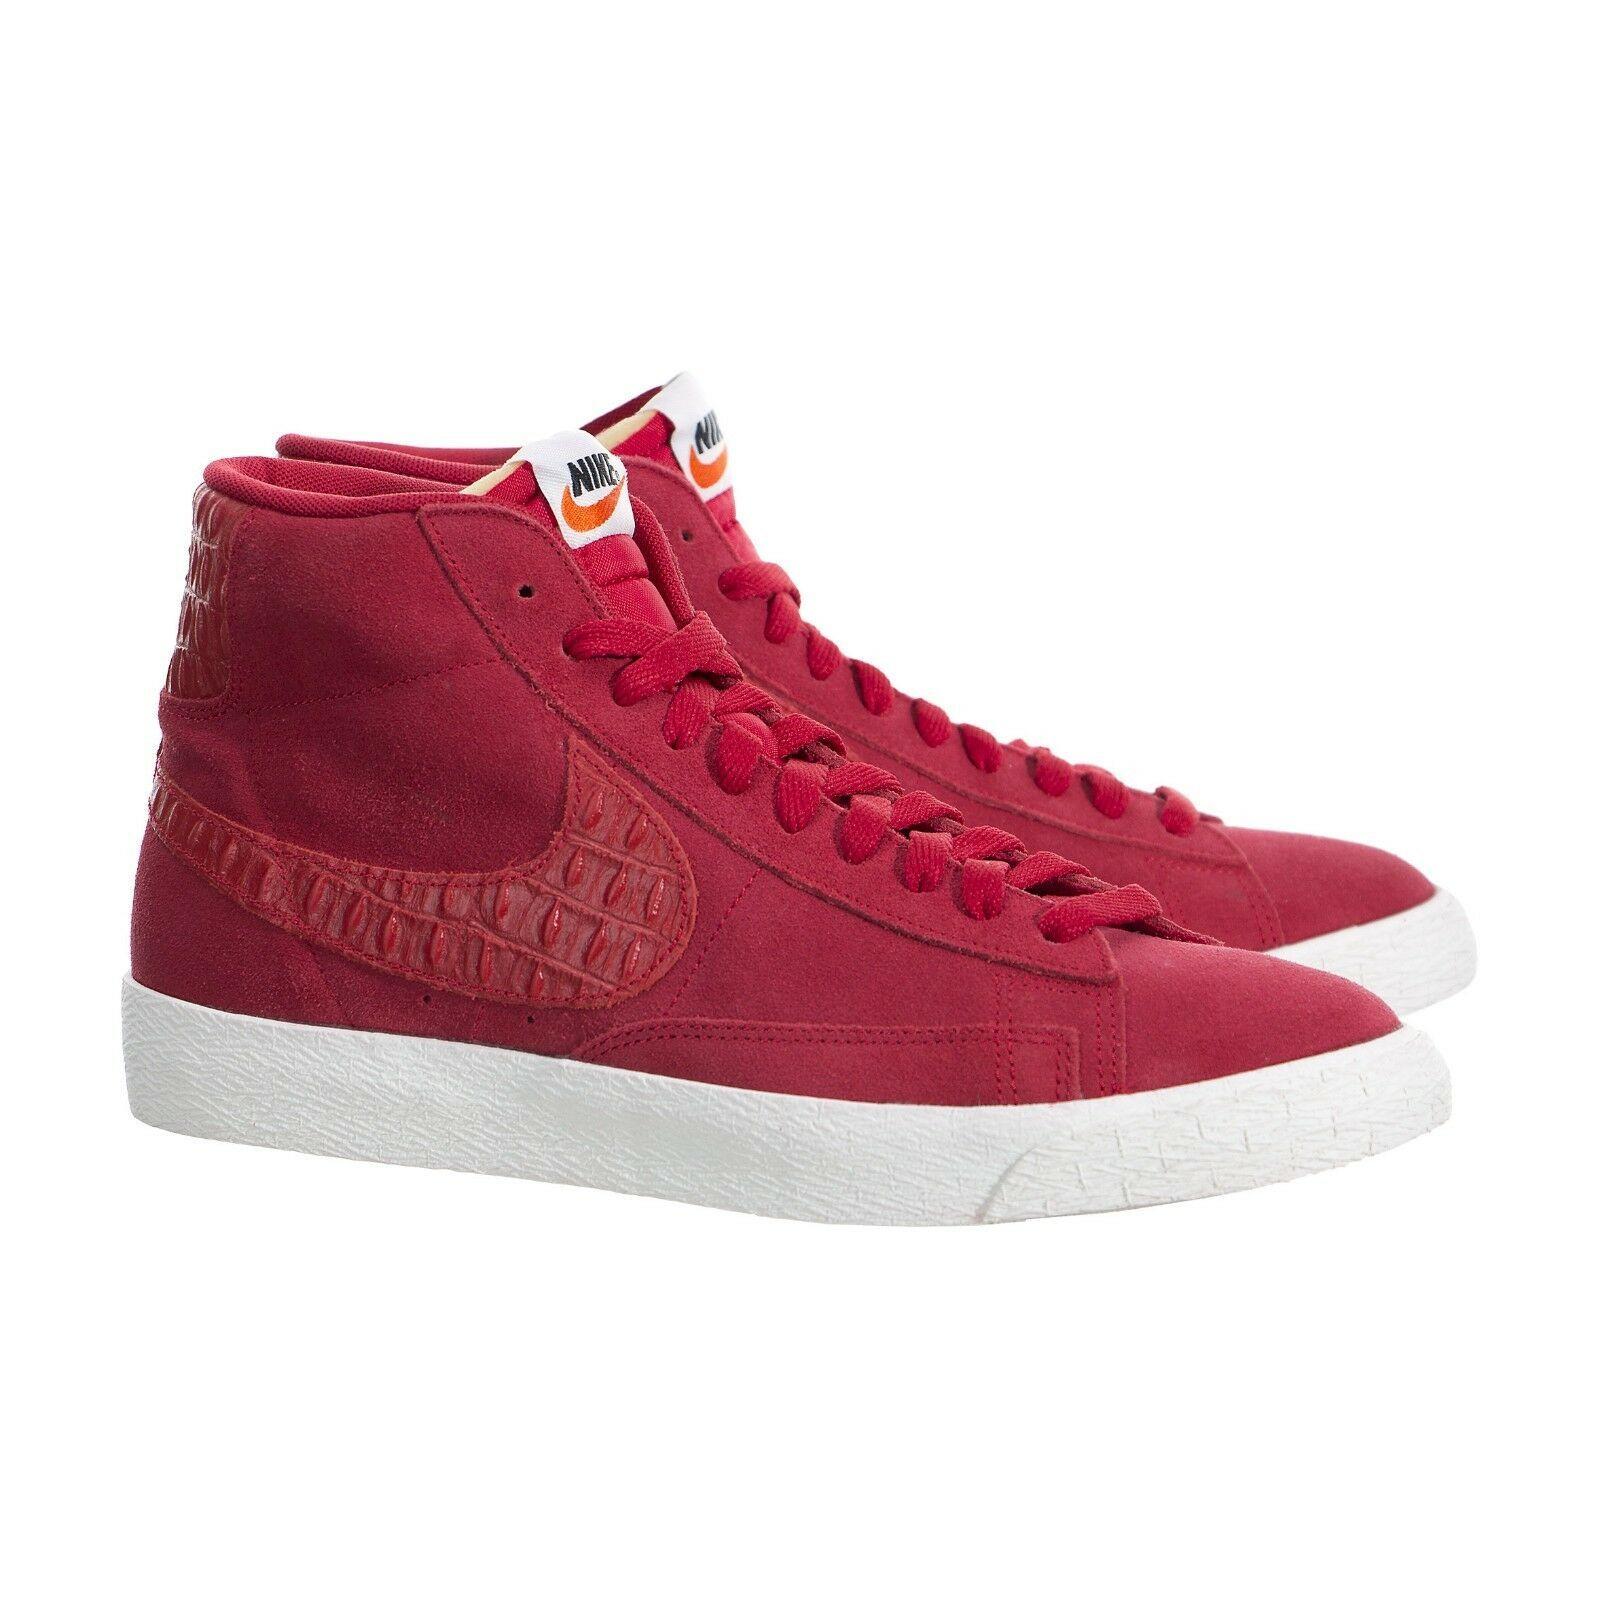 0522978204da3 Nike Blazer Mid Premium Vintage Rosso and 50 similar items. 57